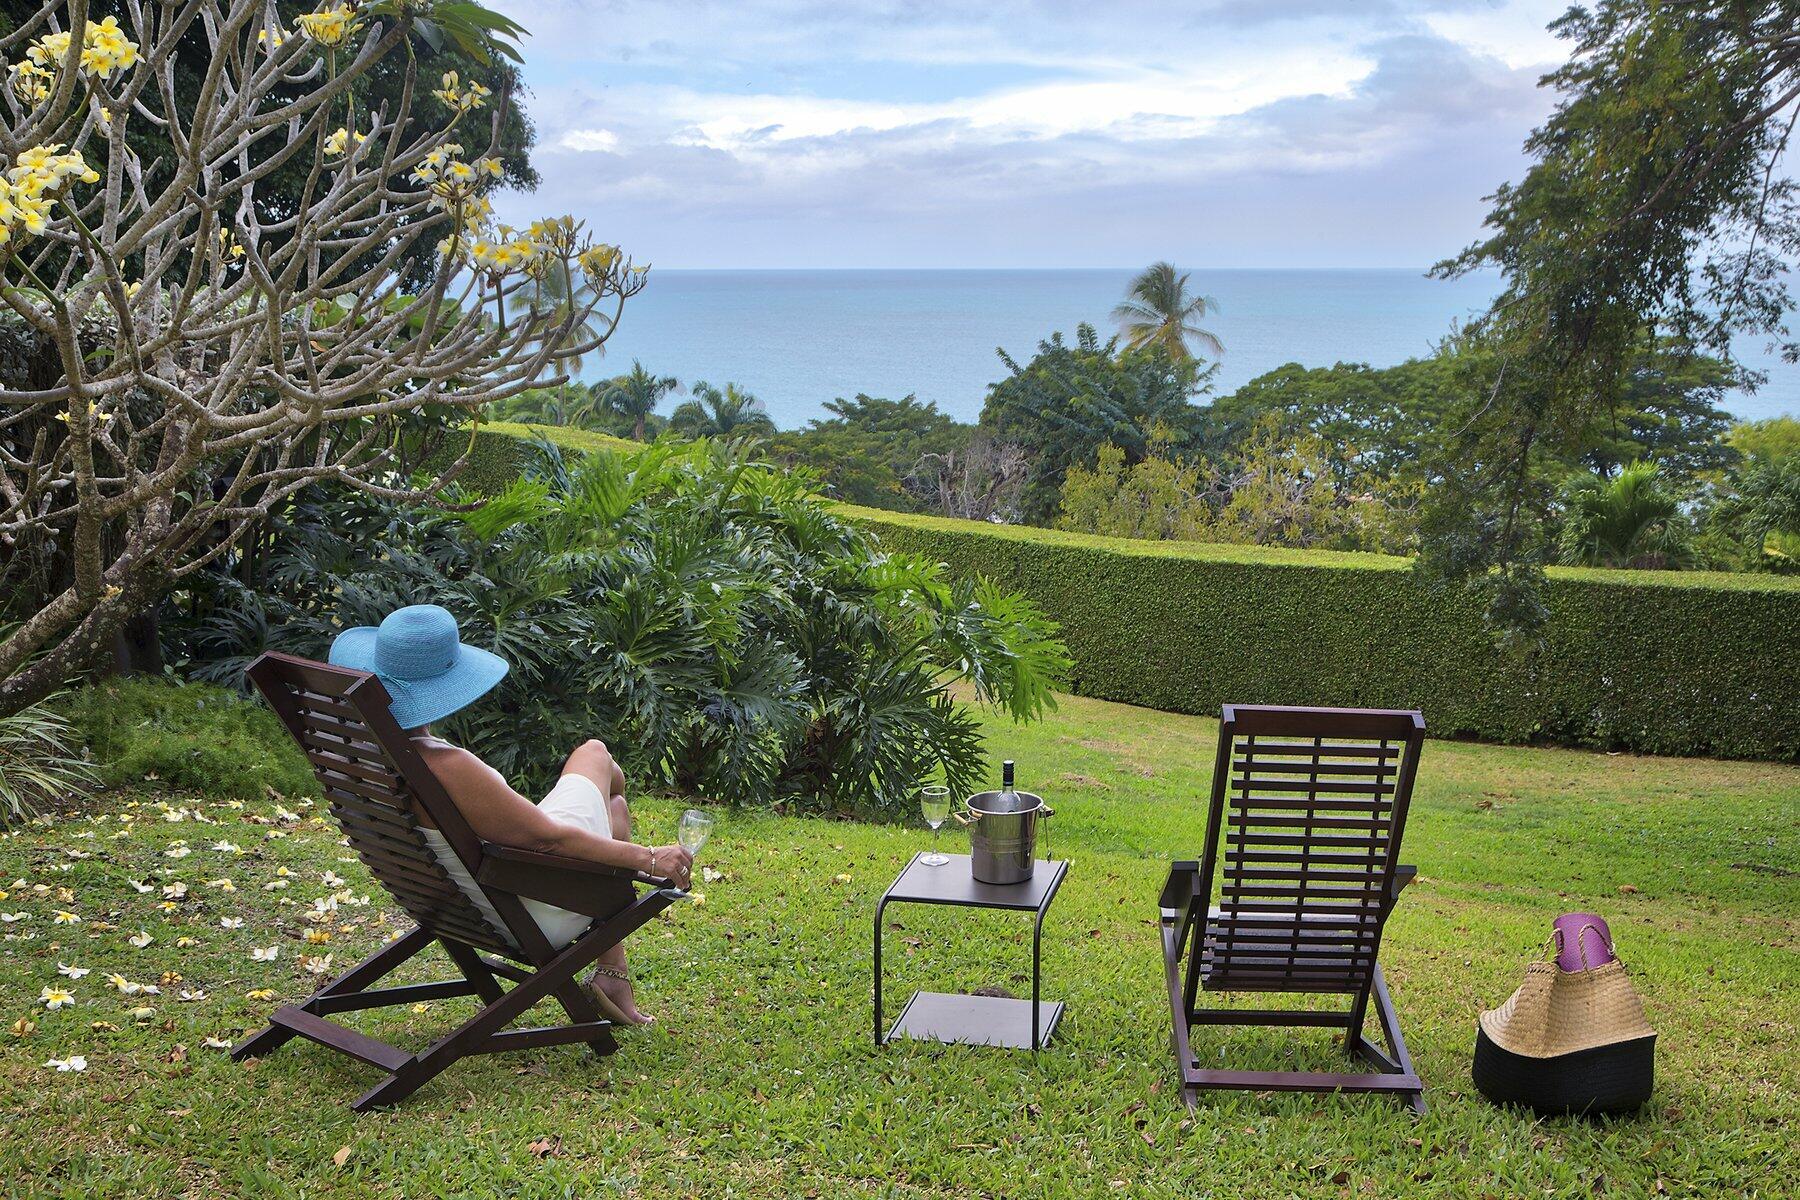 Woman reclining in Trinidad garden